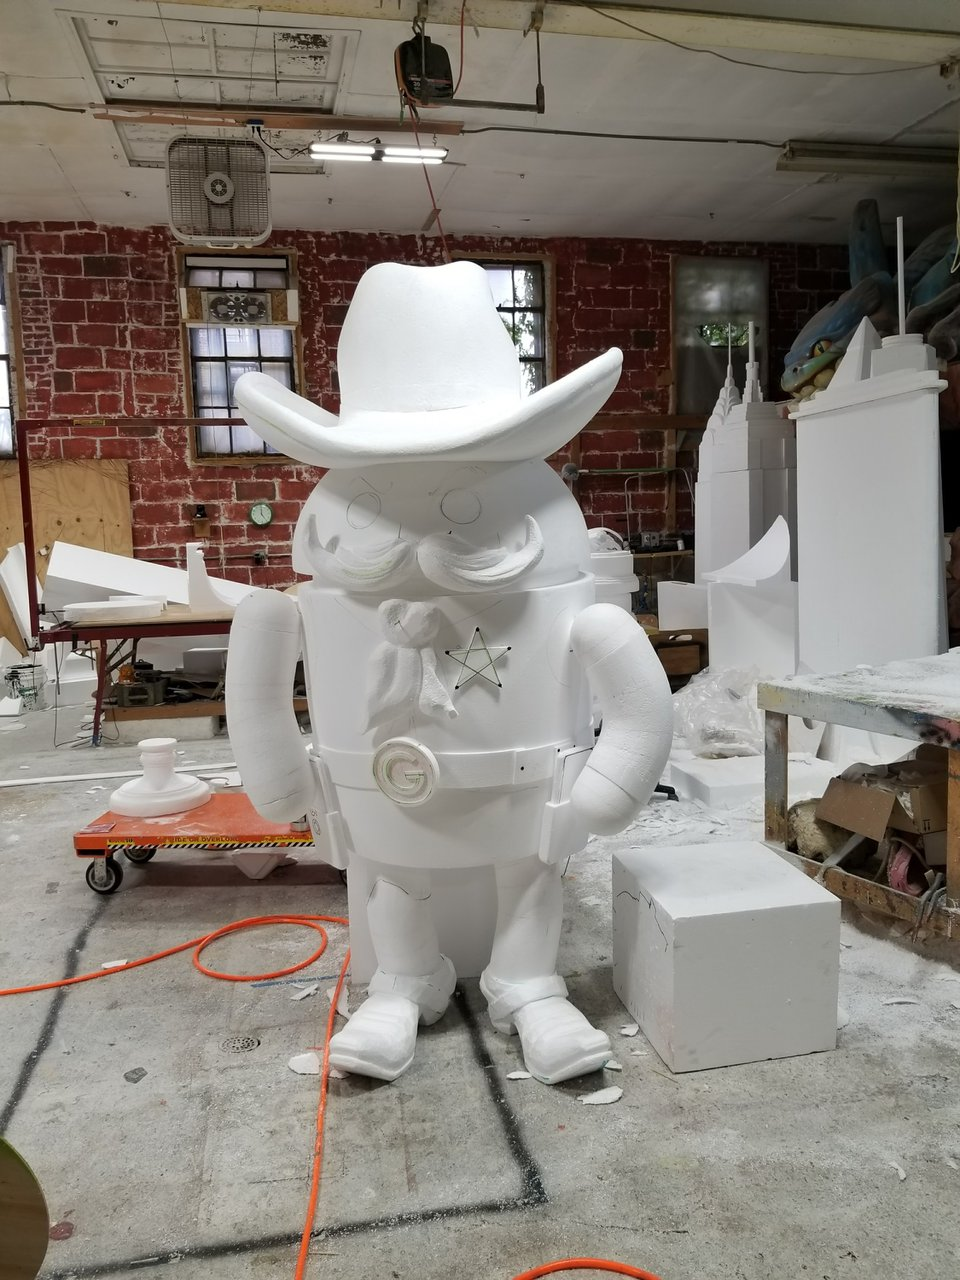 Texas Google Android photo 20170918_170231.jpg